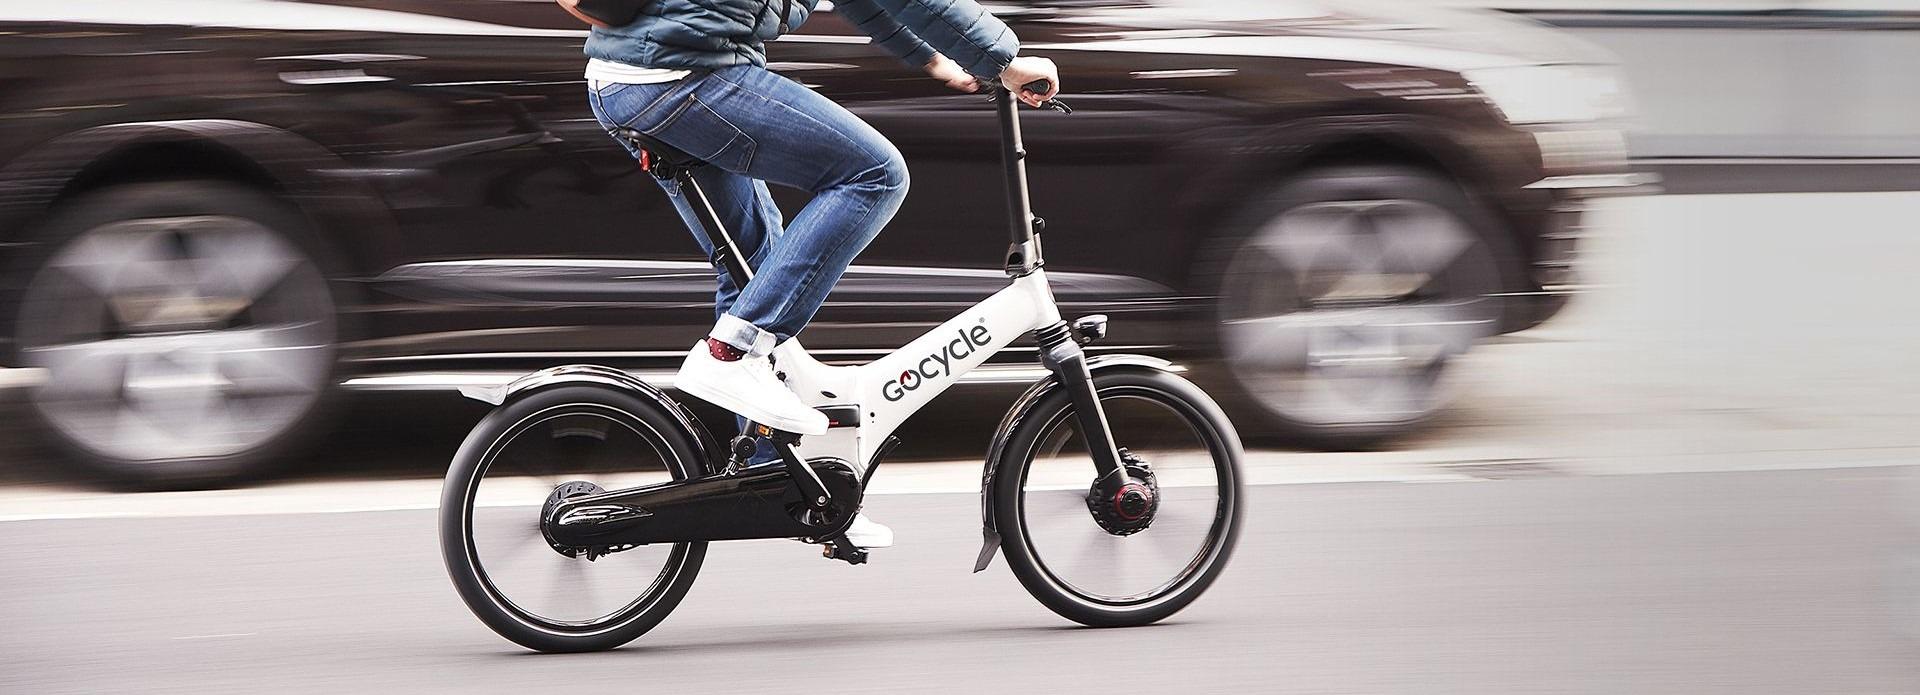 GX Gocycle